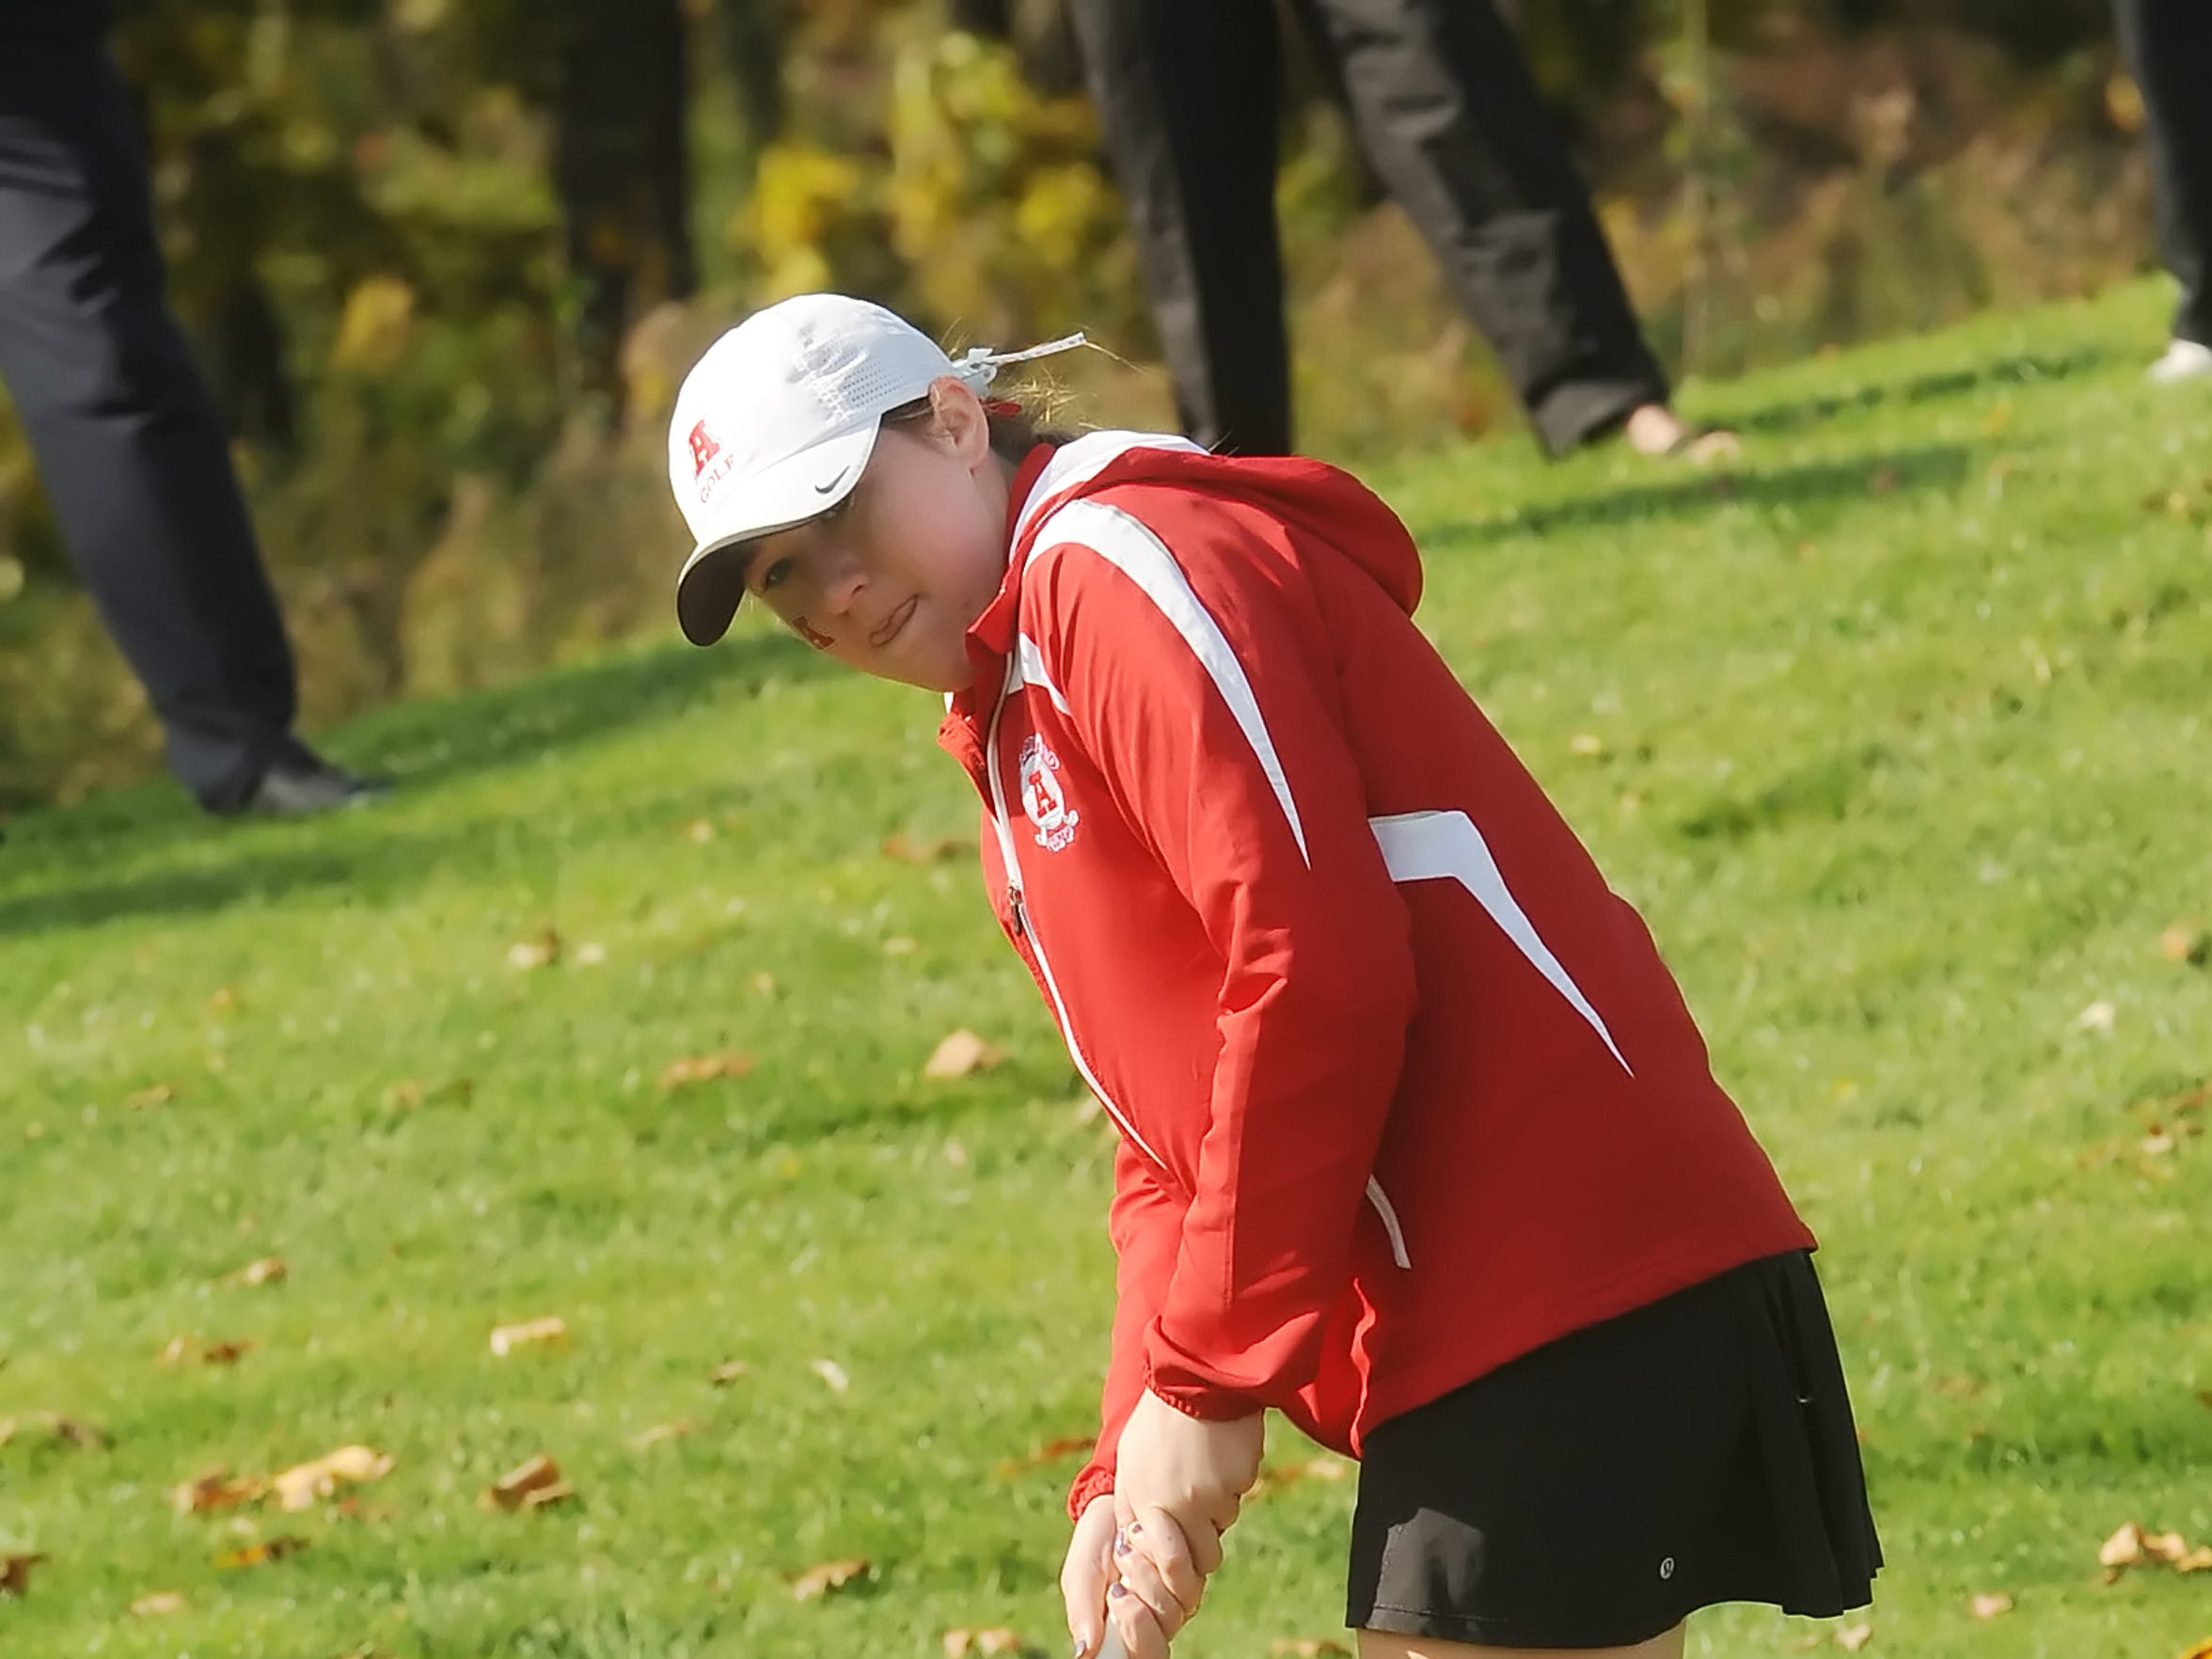 Arrowhead sophomore Emily Lauterbach watches her putt